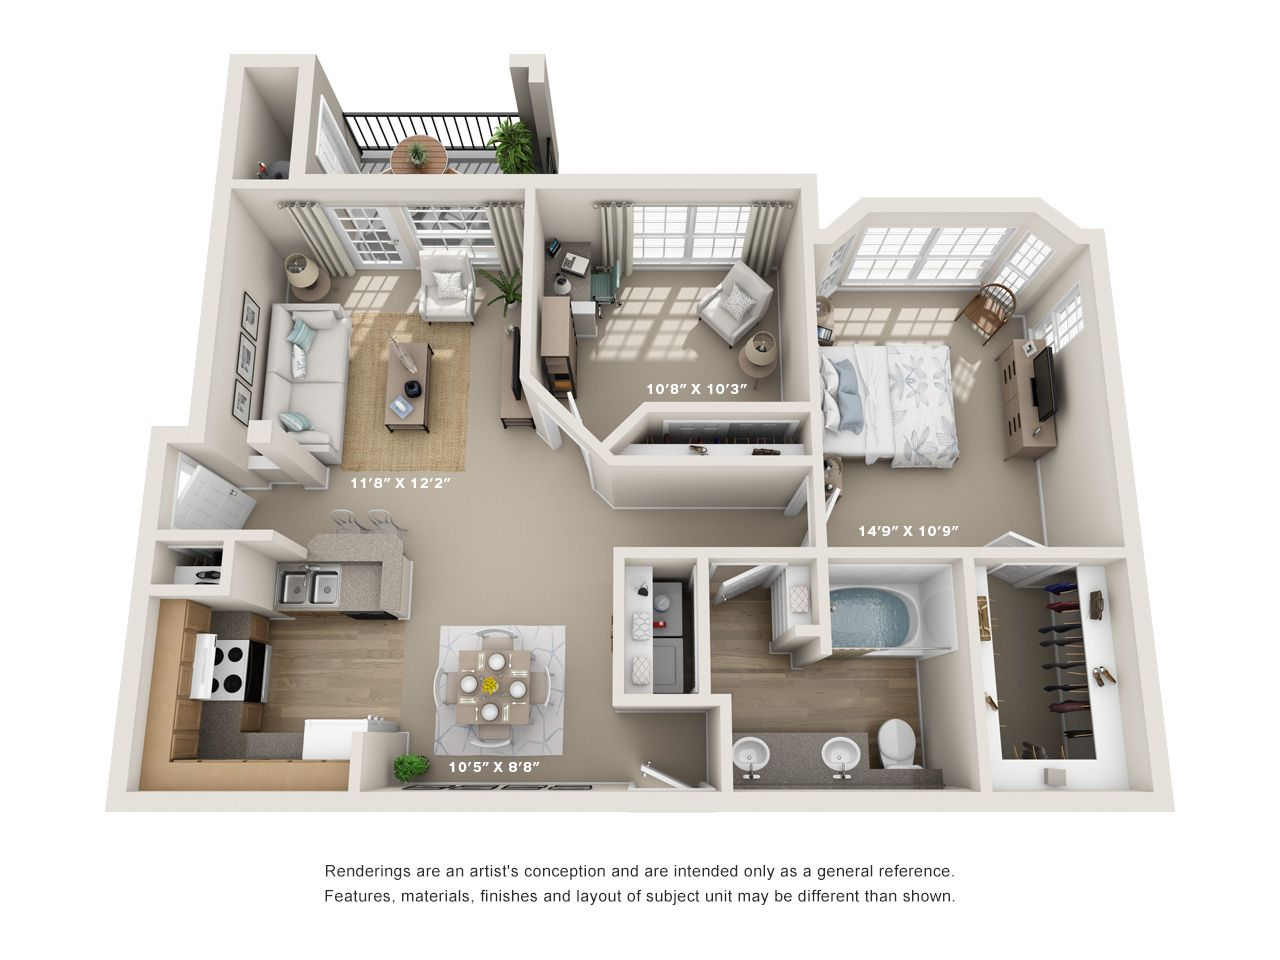 One Two And Three Bedroom Apartments In Austin Tx Austin Texas Apartment Steadfa Studio Apartment Floor Plans Apartment Floor Plans Sims House Design